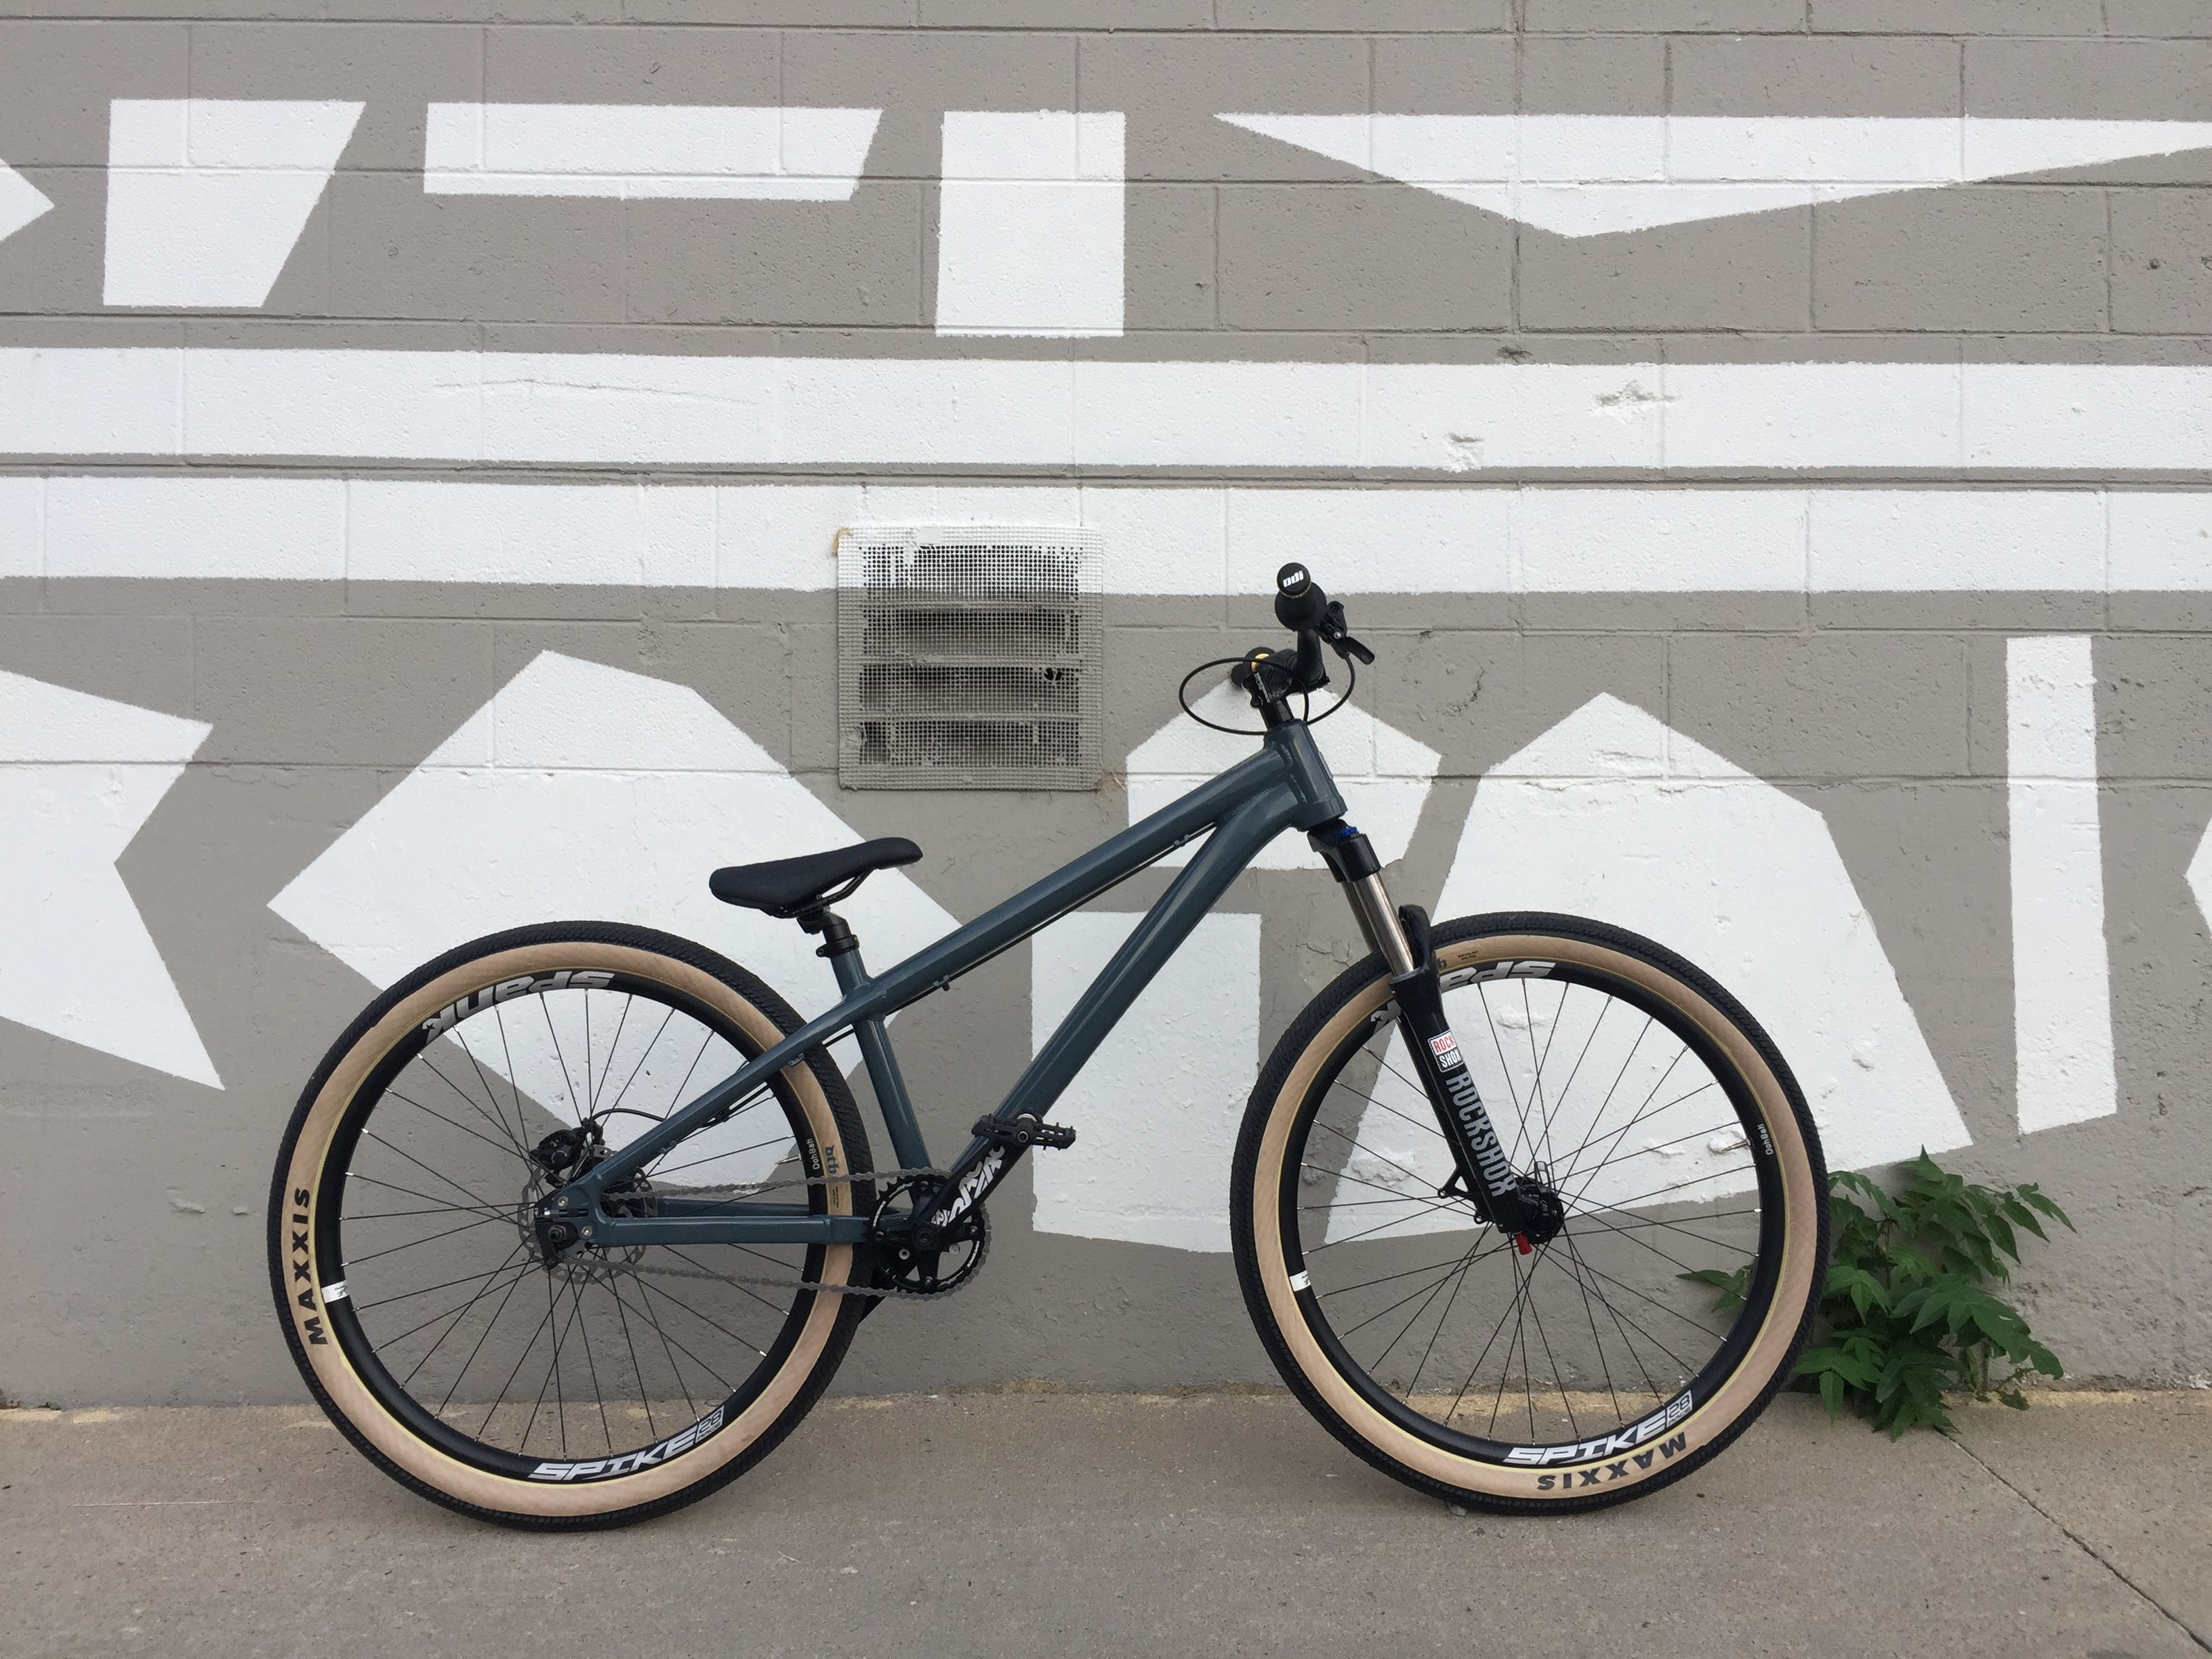 My Custom 2017 Santa Cruz Jackal Bmx Dirt Moutain Bike Trial Bike